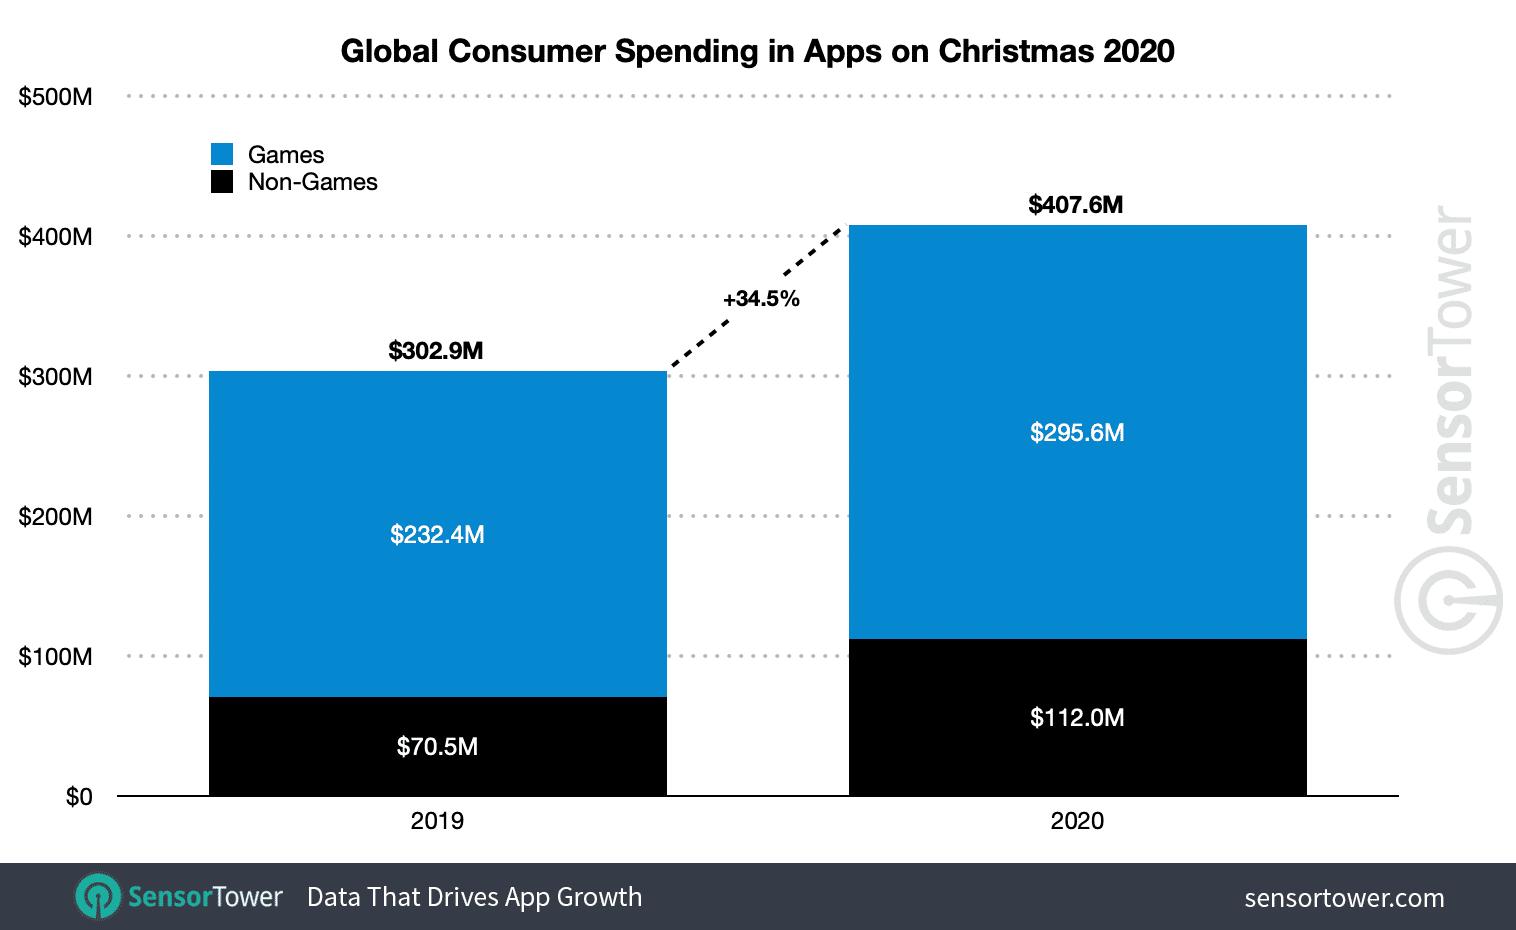 App-Ausgaben weltweit Weihnachten 2020 - Infografik - Sensor tower